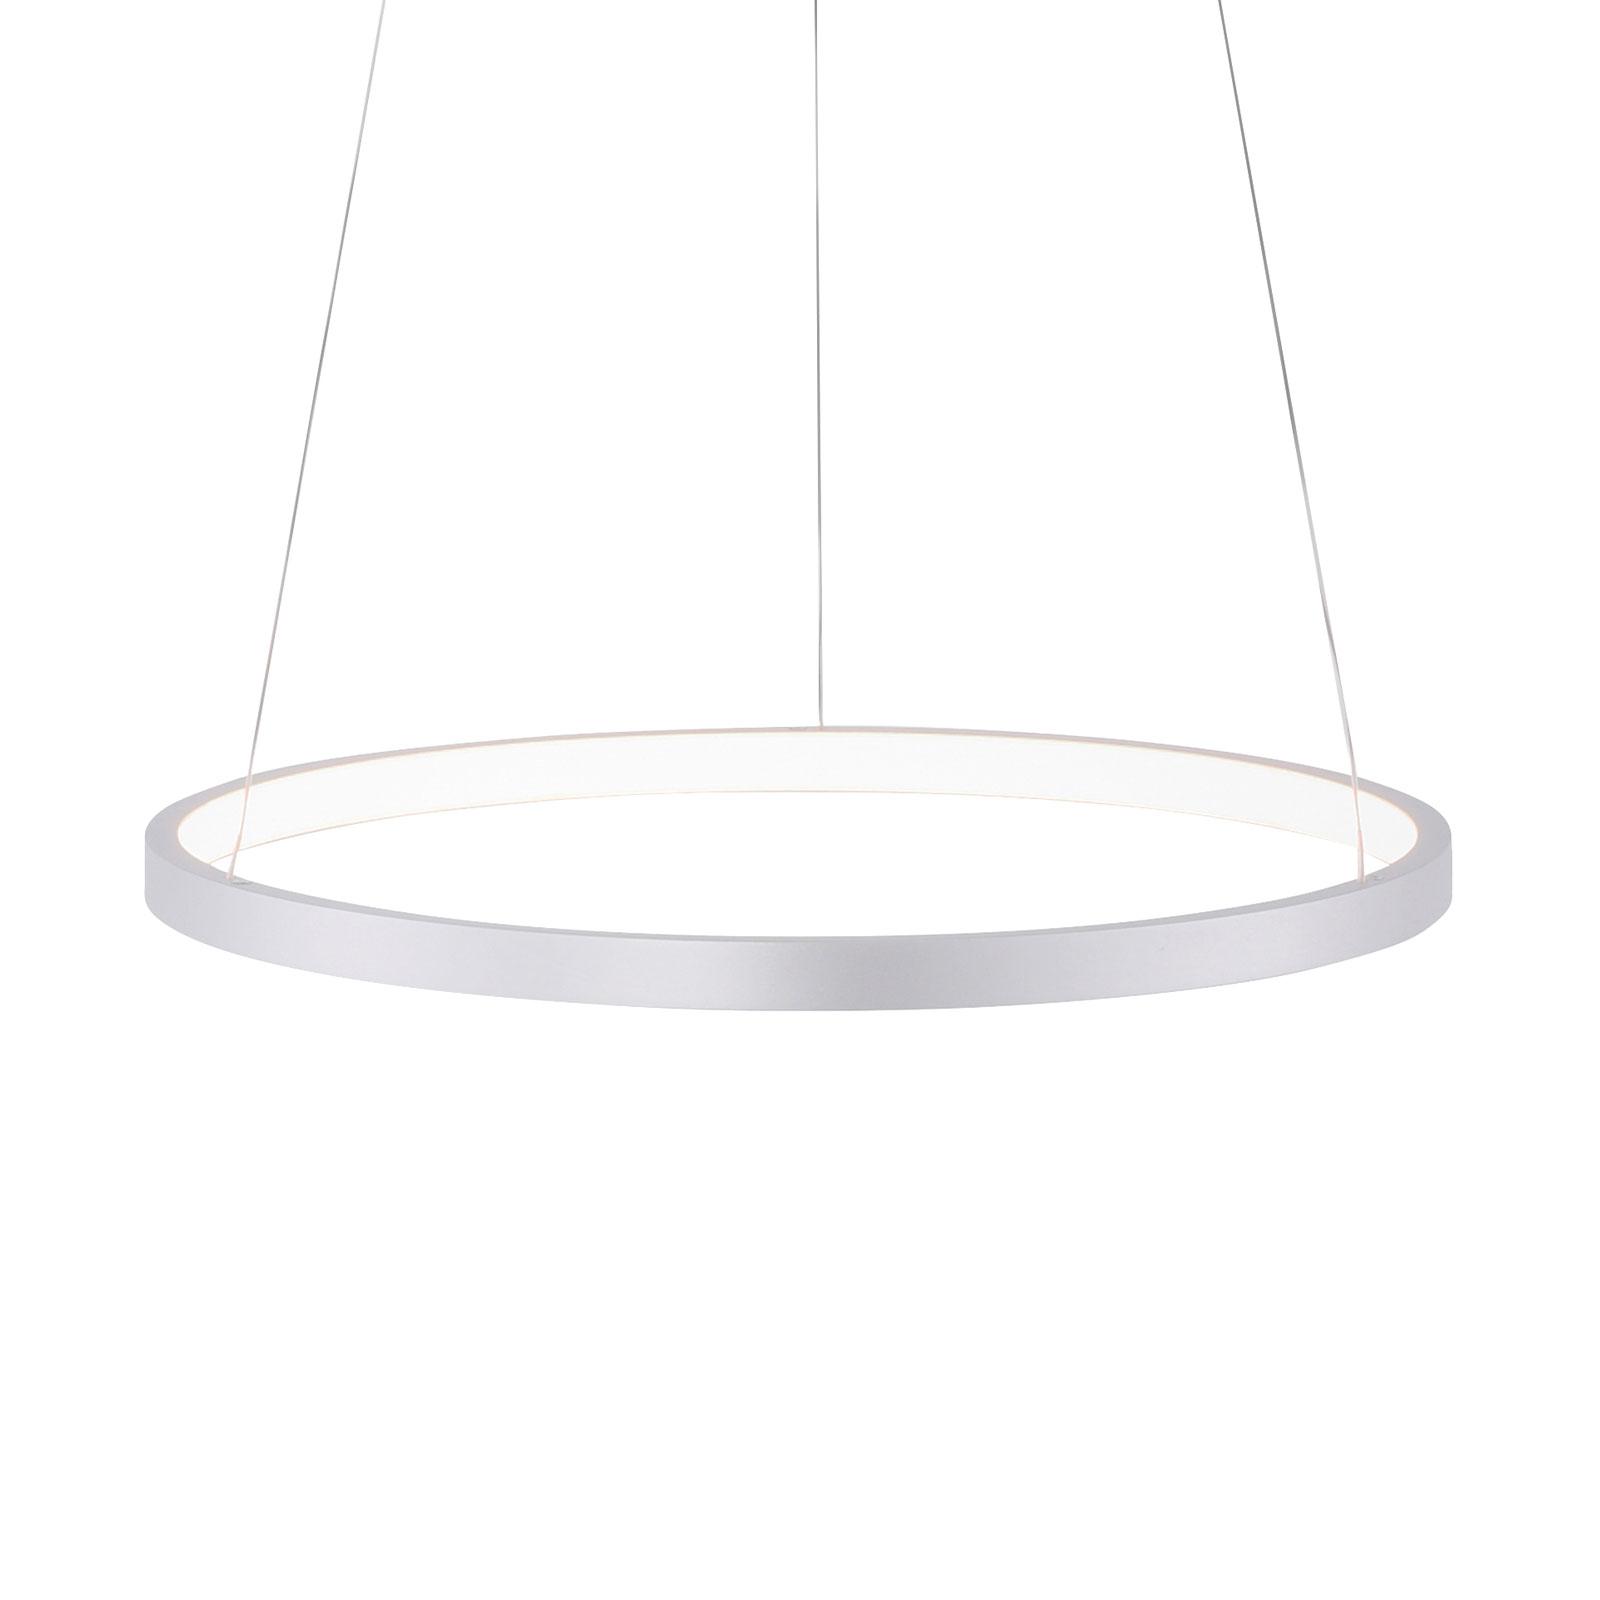 LED hanglamp Circle, zilver, Ø 39 cm